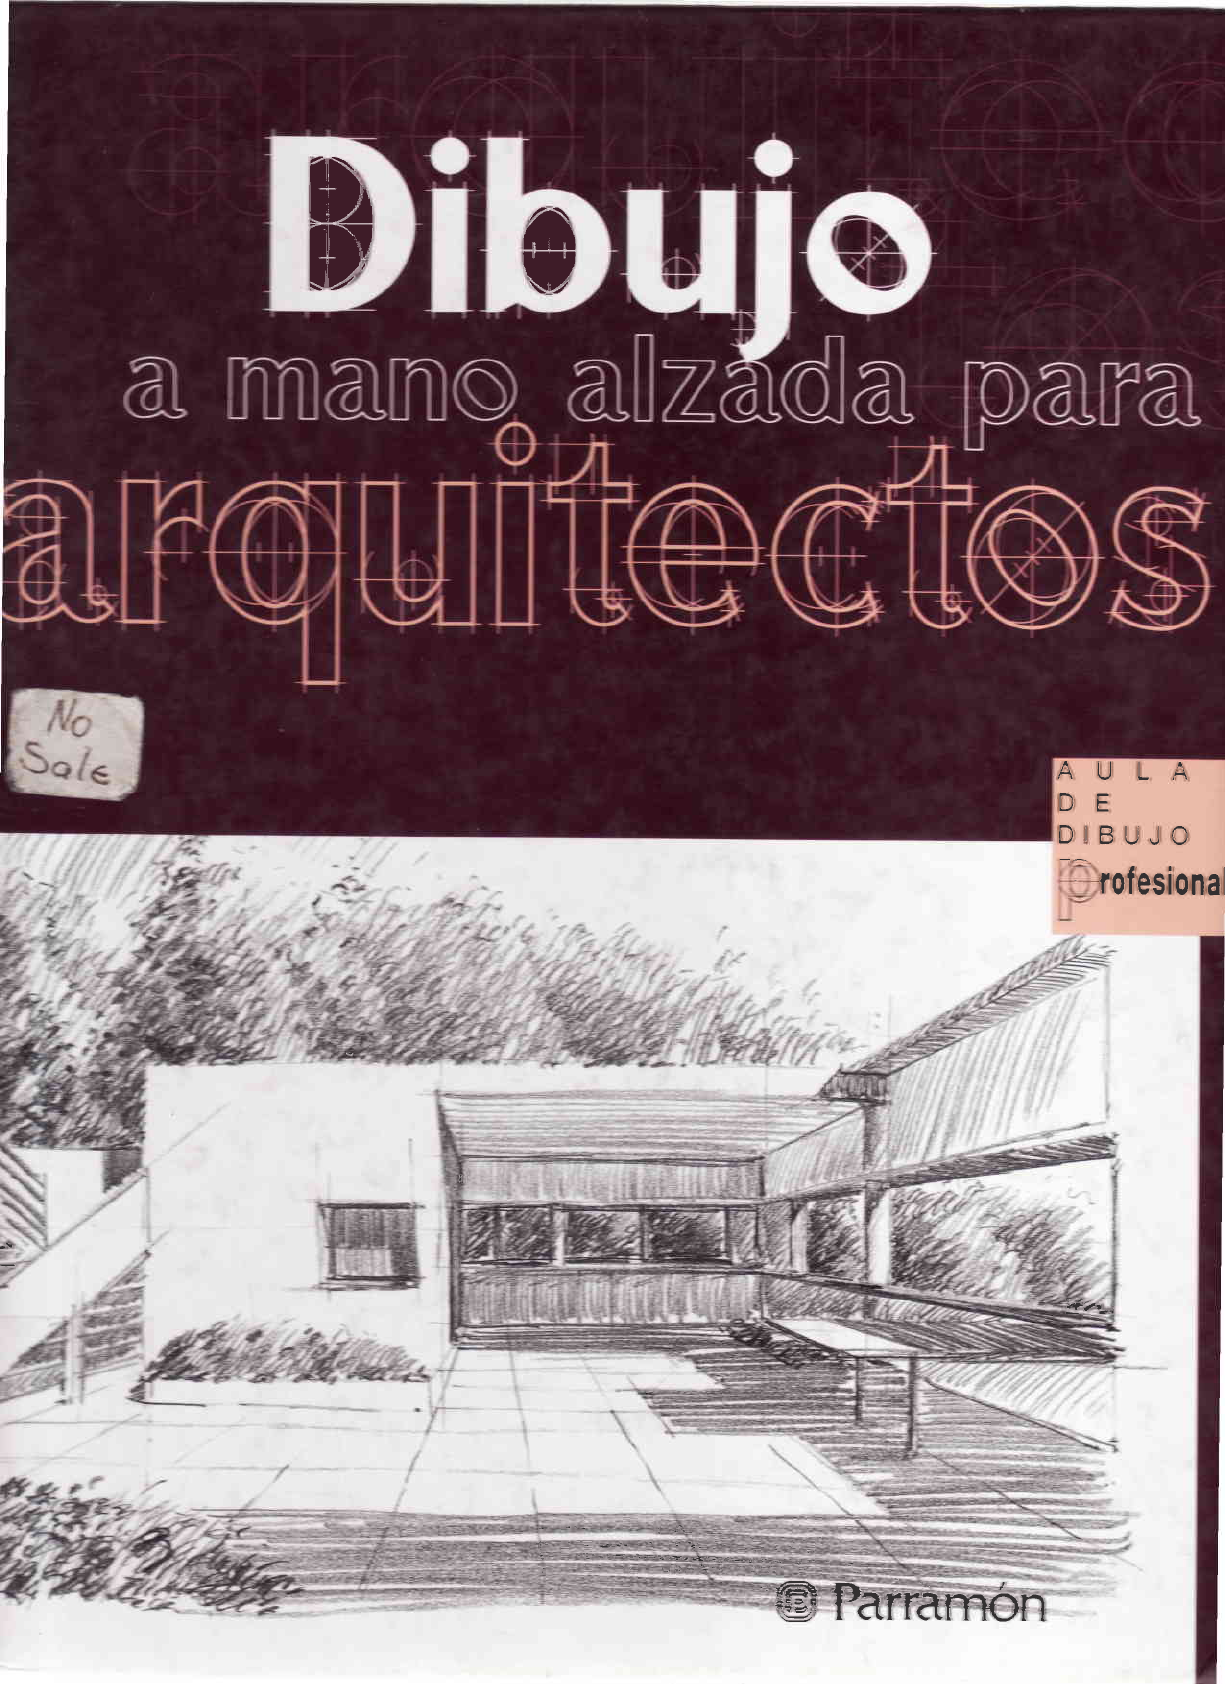 Dibujo a mano alzada para arq documents for Croquis un libro de arquitectura para dibujar pdf